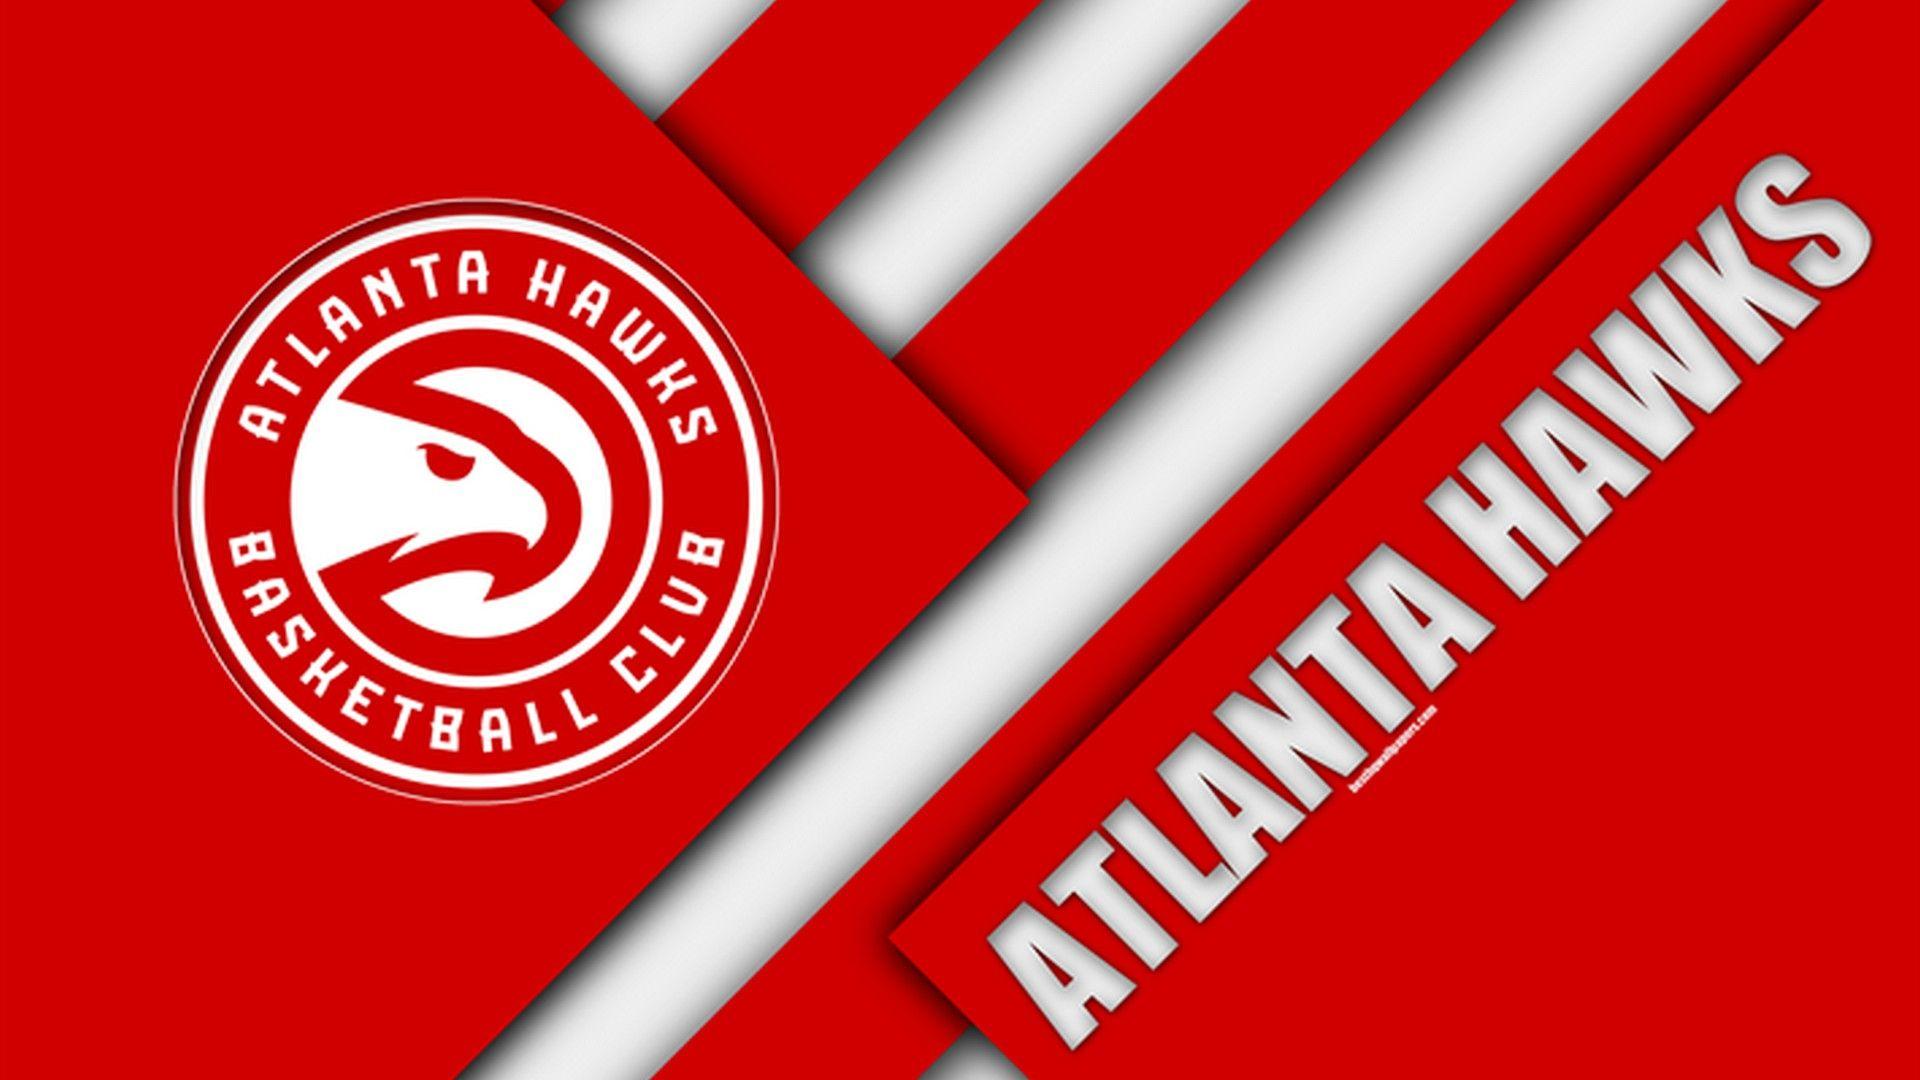 Wallpapers Atlanta Hawks 2021 Basketball Wallpaper Atlanta Hawks Basketball Wallpaper Nba Eastern Conference